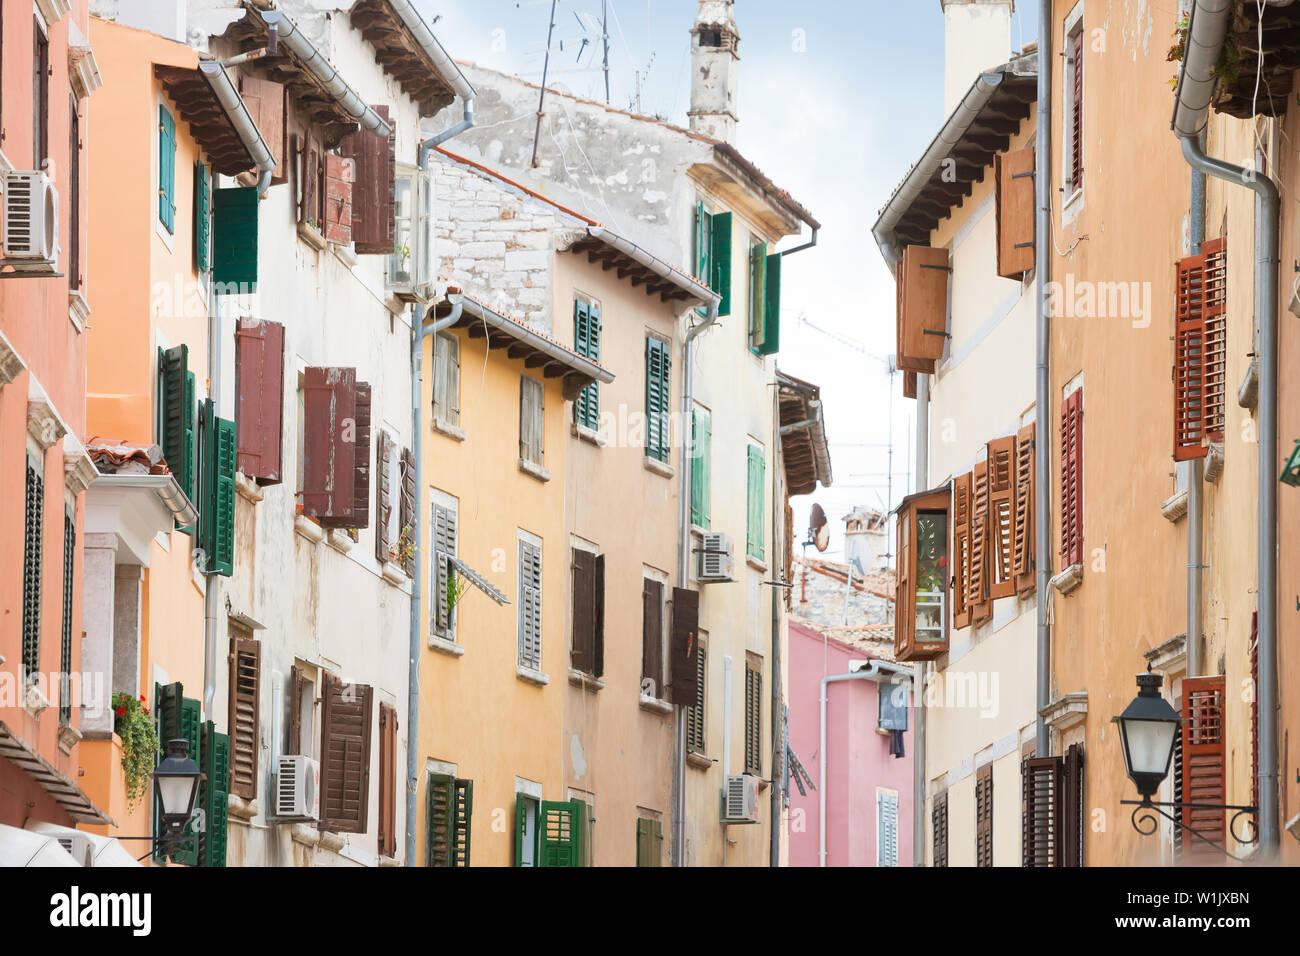 Rovinj, Istrien, Kroatien, Europa - hölzerne Gitter Jalousien an den Häusern von Rovinj Stockfoto